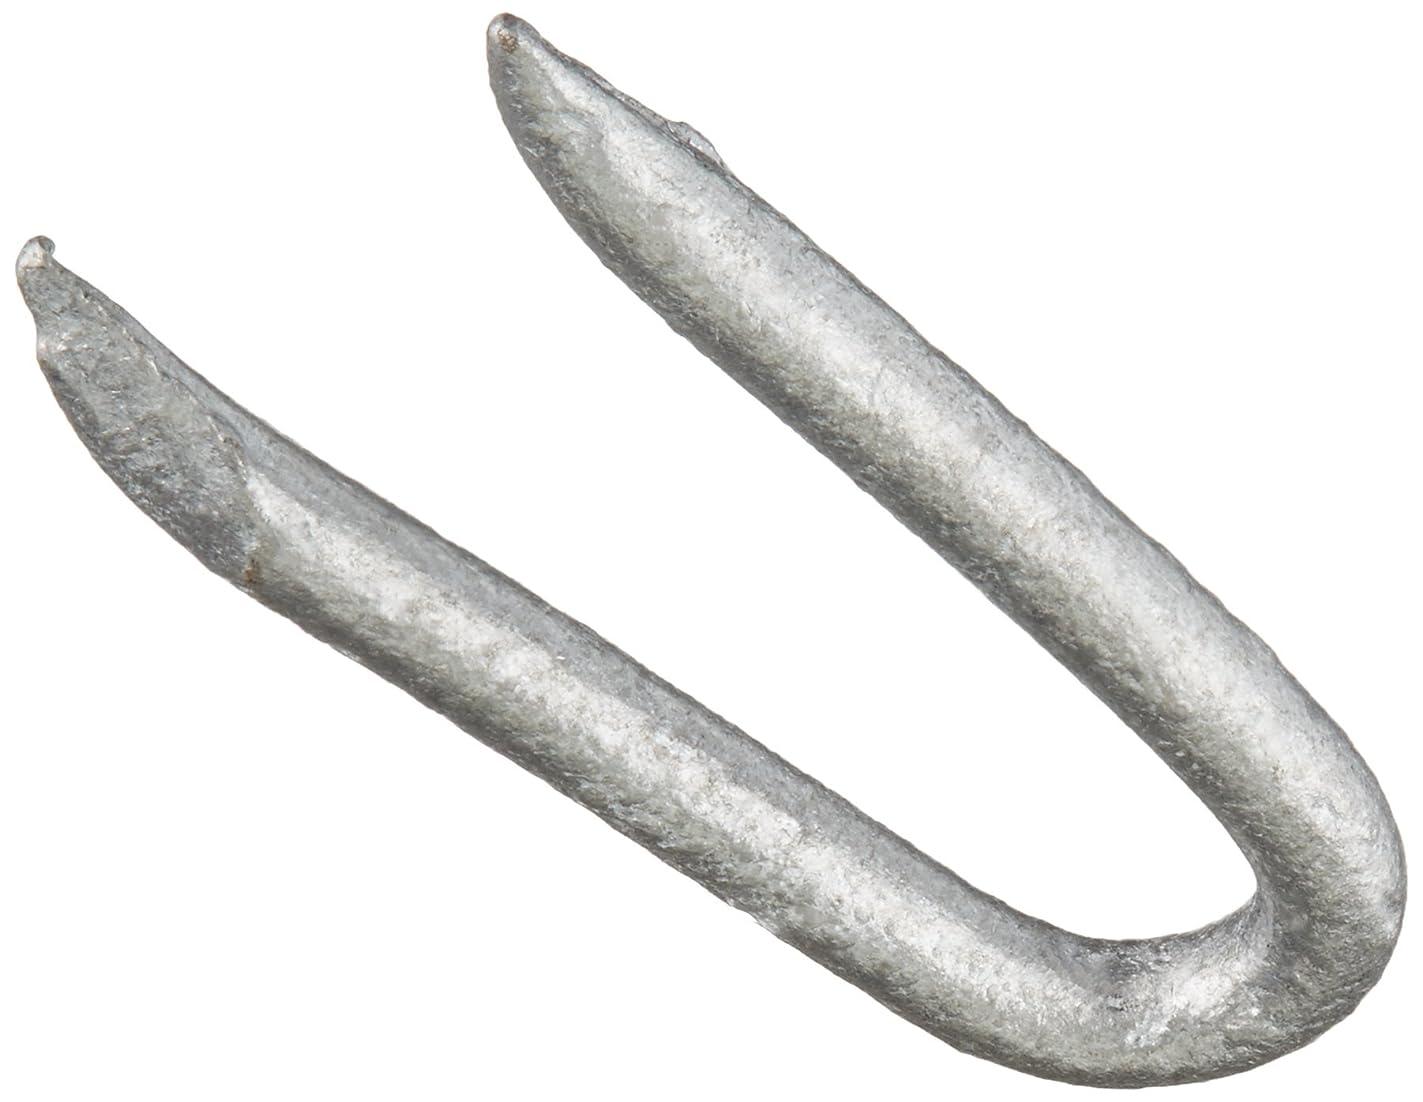 Grip Rite 112HGFS5 5 lb Galvanized Fence Staple, 1-1/2